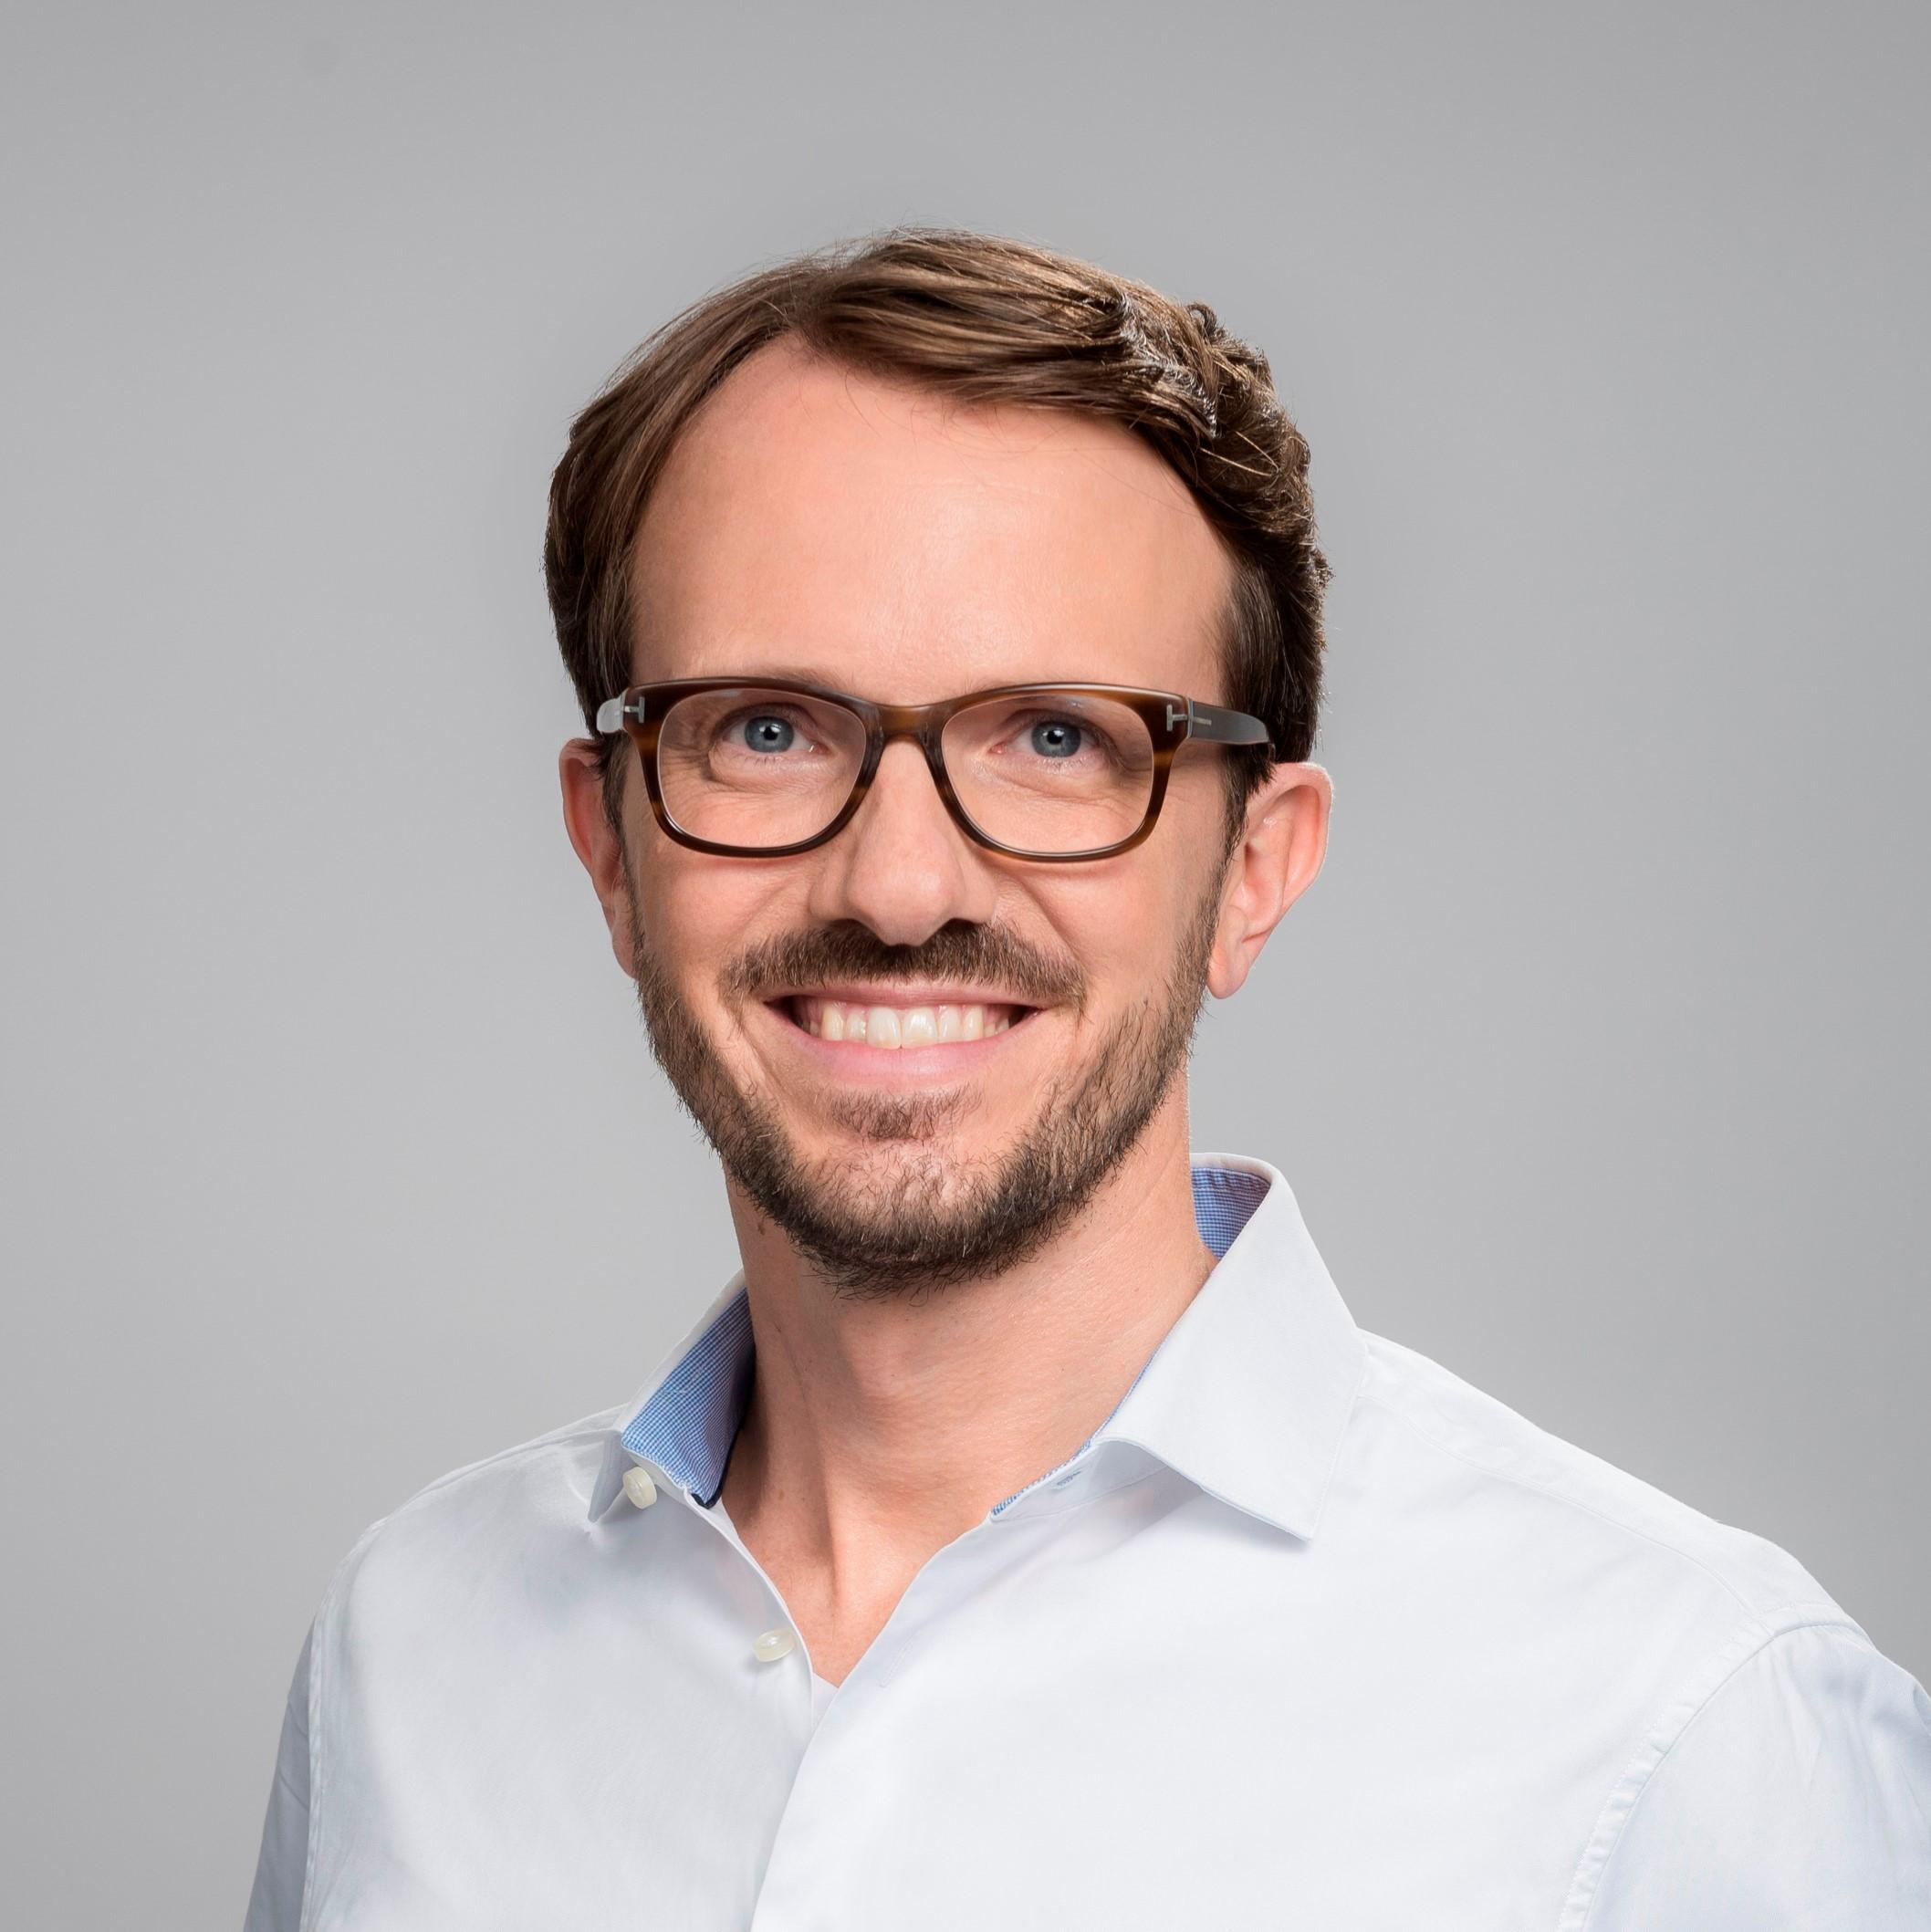 Sebastian Dettmers